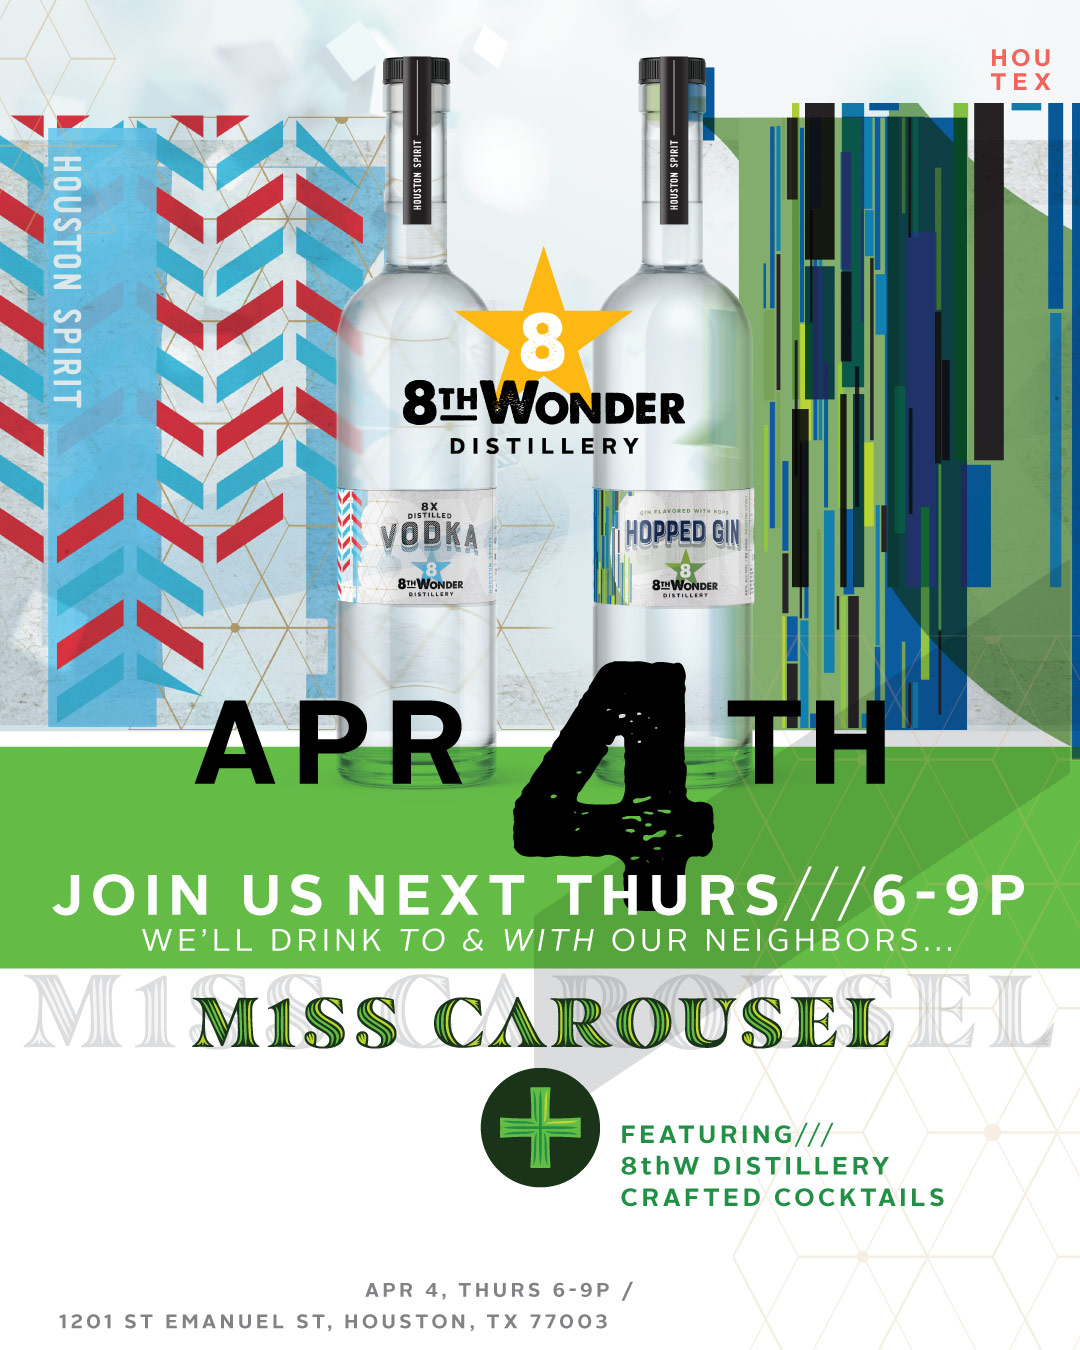 8WB-Carousel_Apr2019-FINAL_6c7ccb500760b63d013aaf58f94af3c7.jpeg